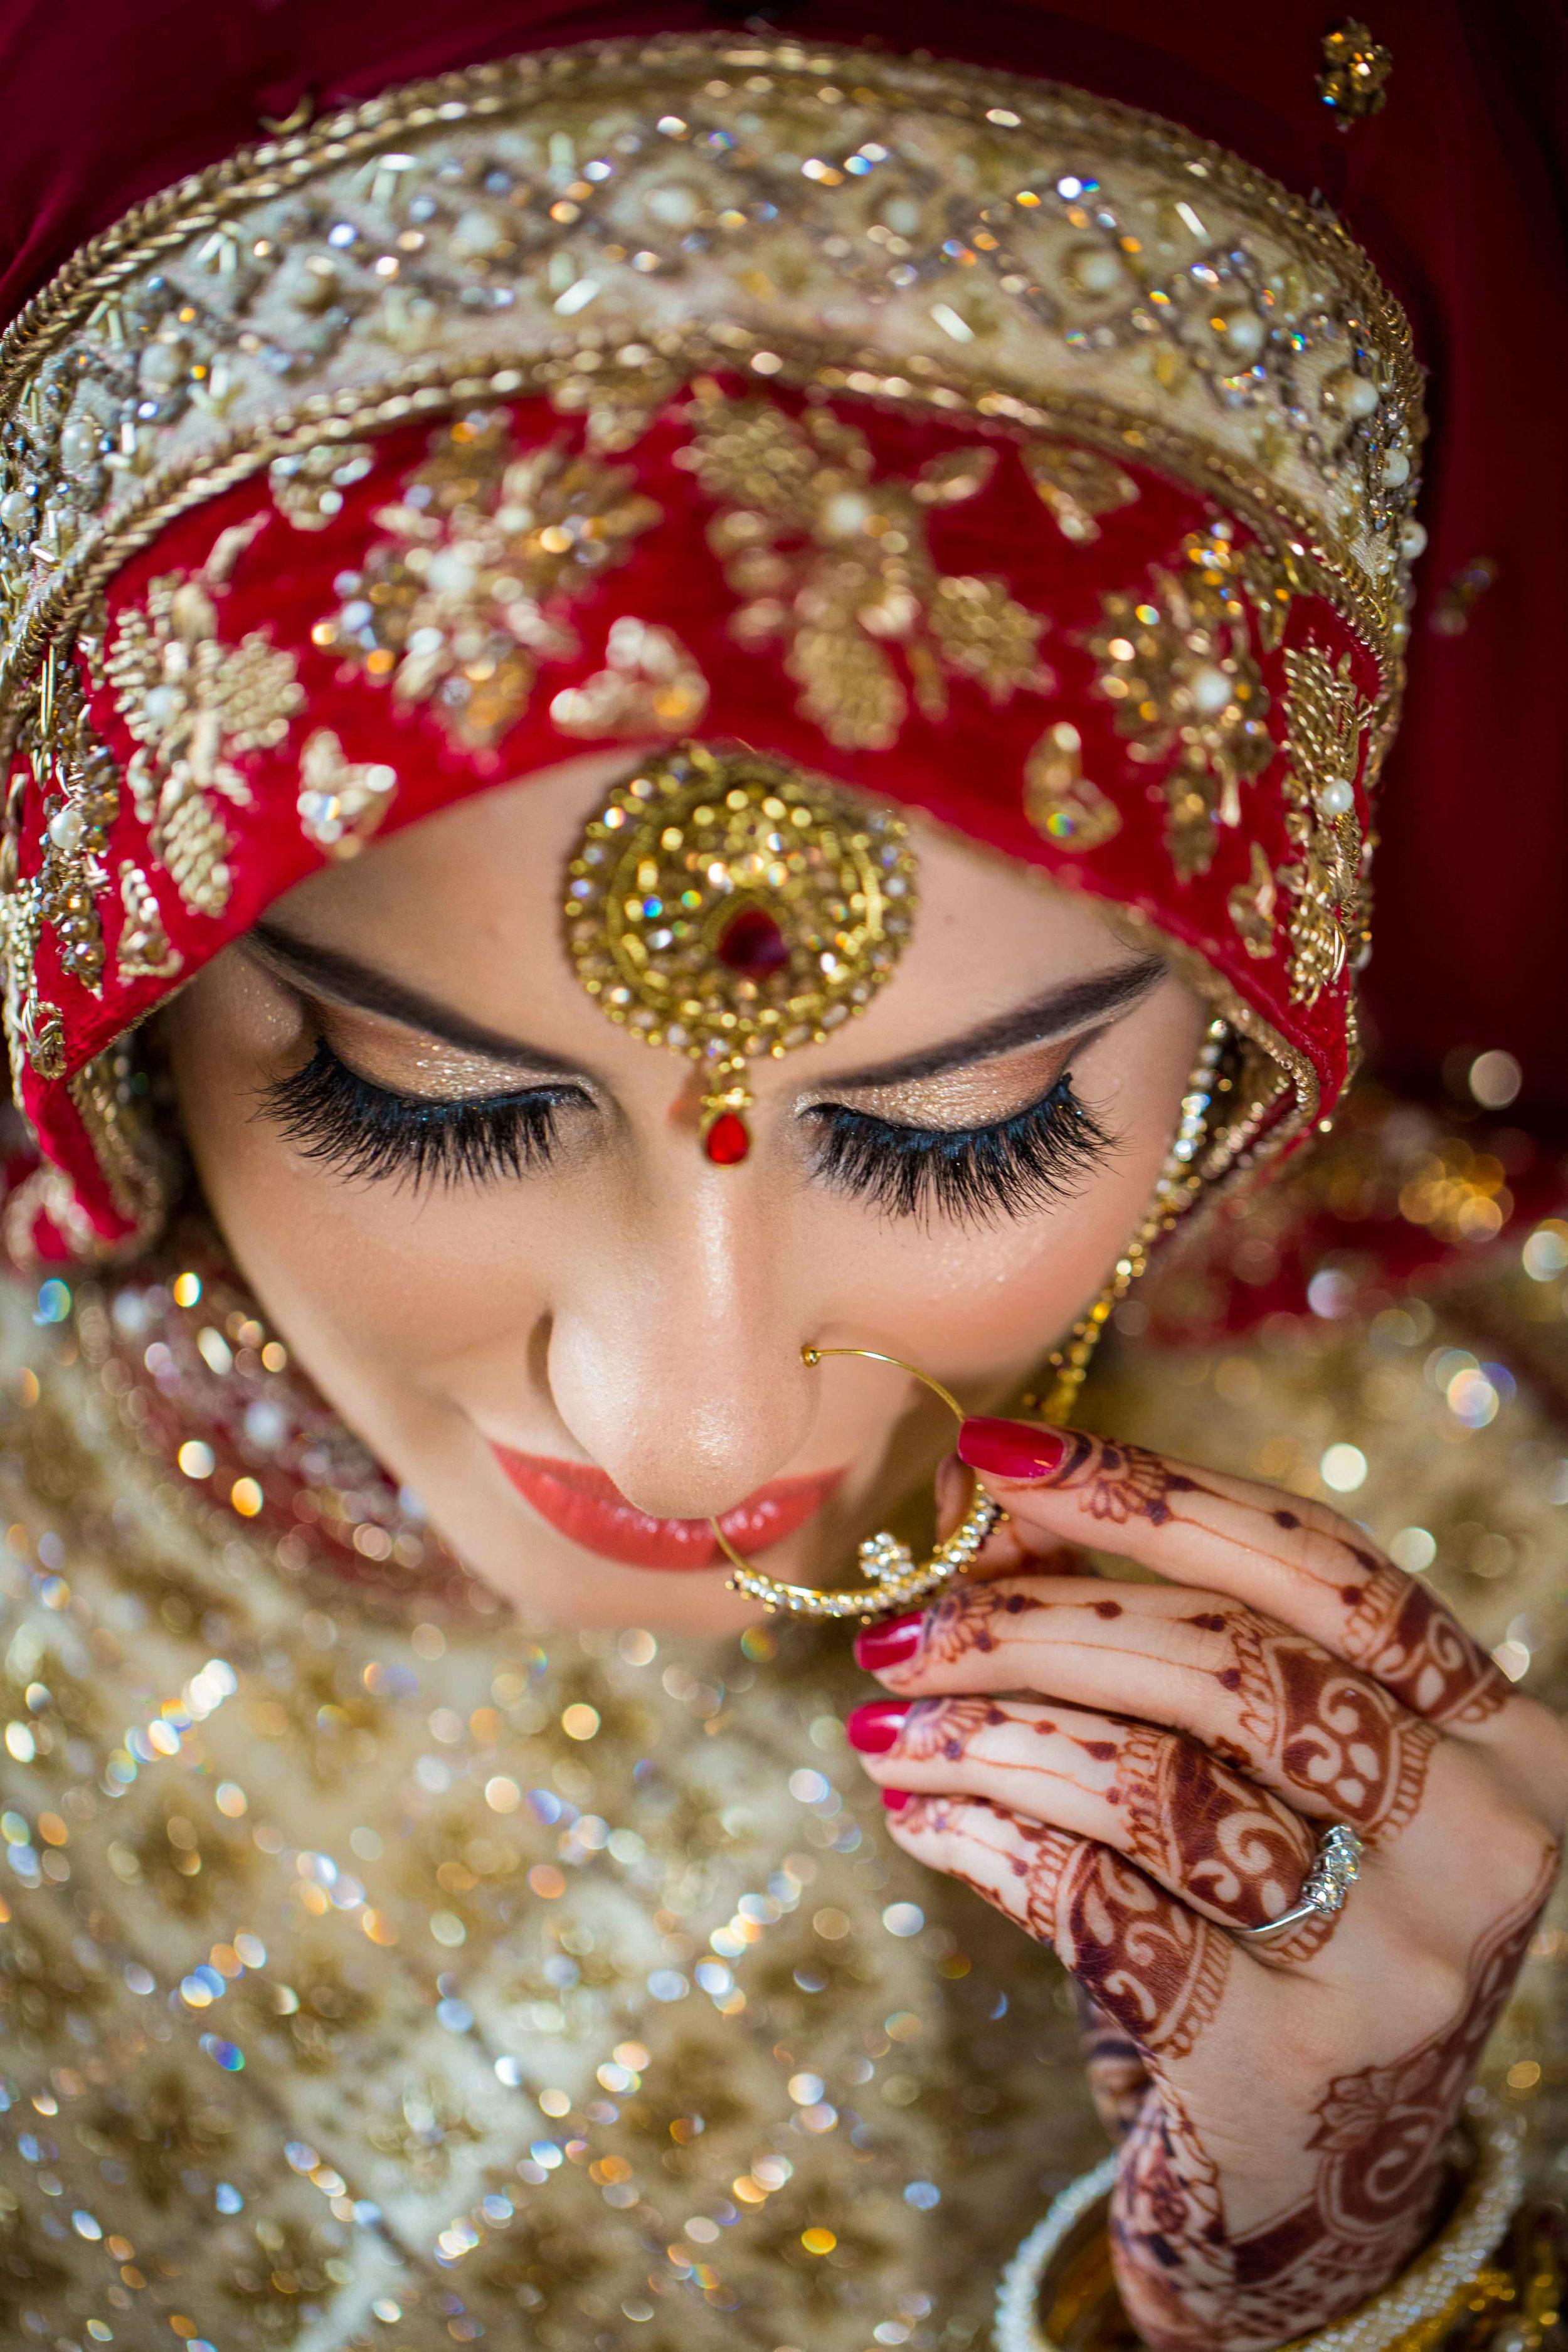 Macdonald-Berystede-Hotel-wedding-female-asian-wedding-photographer-london-natalia-smith-photography-15-2.jpg